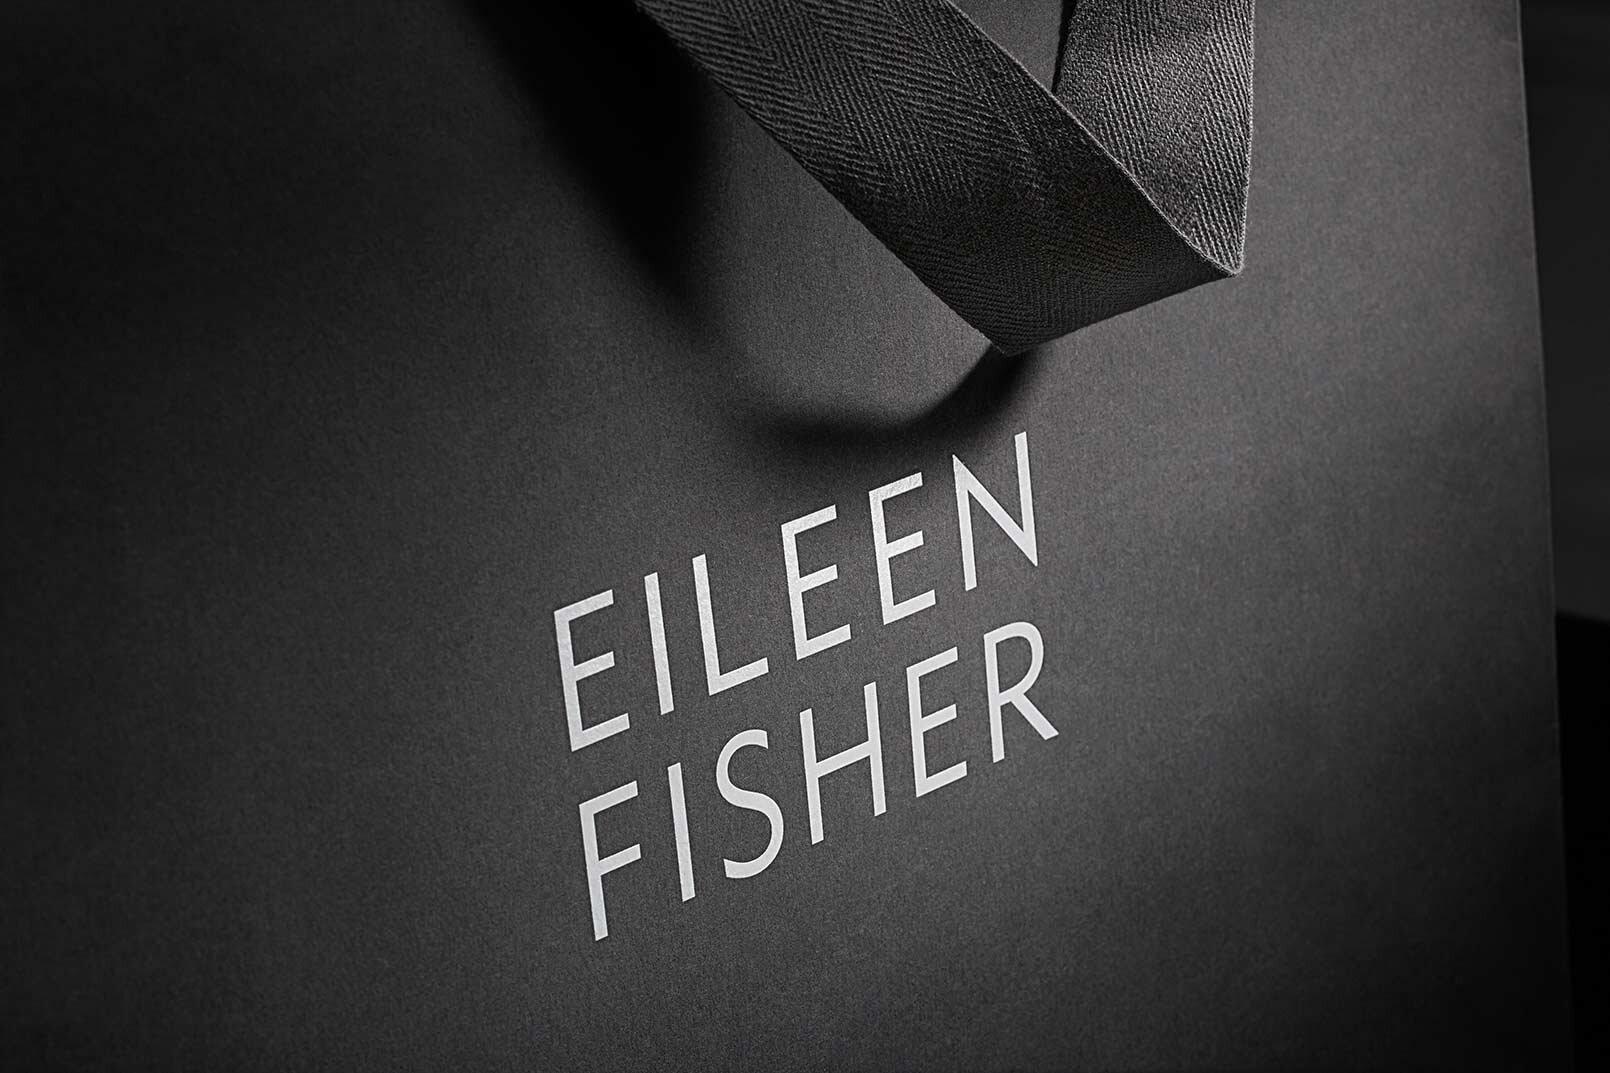 Eileen-Fisher-Shopping-Bag-Design-Packaging-Company-2.JPG